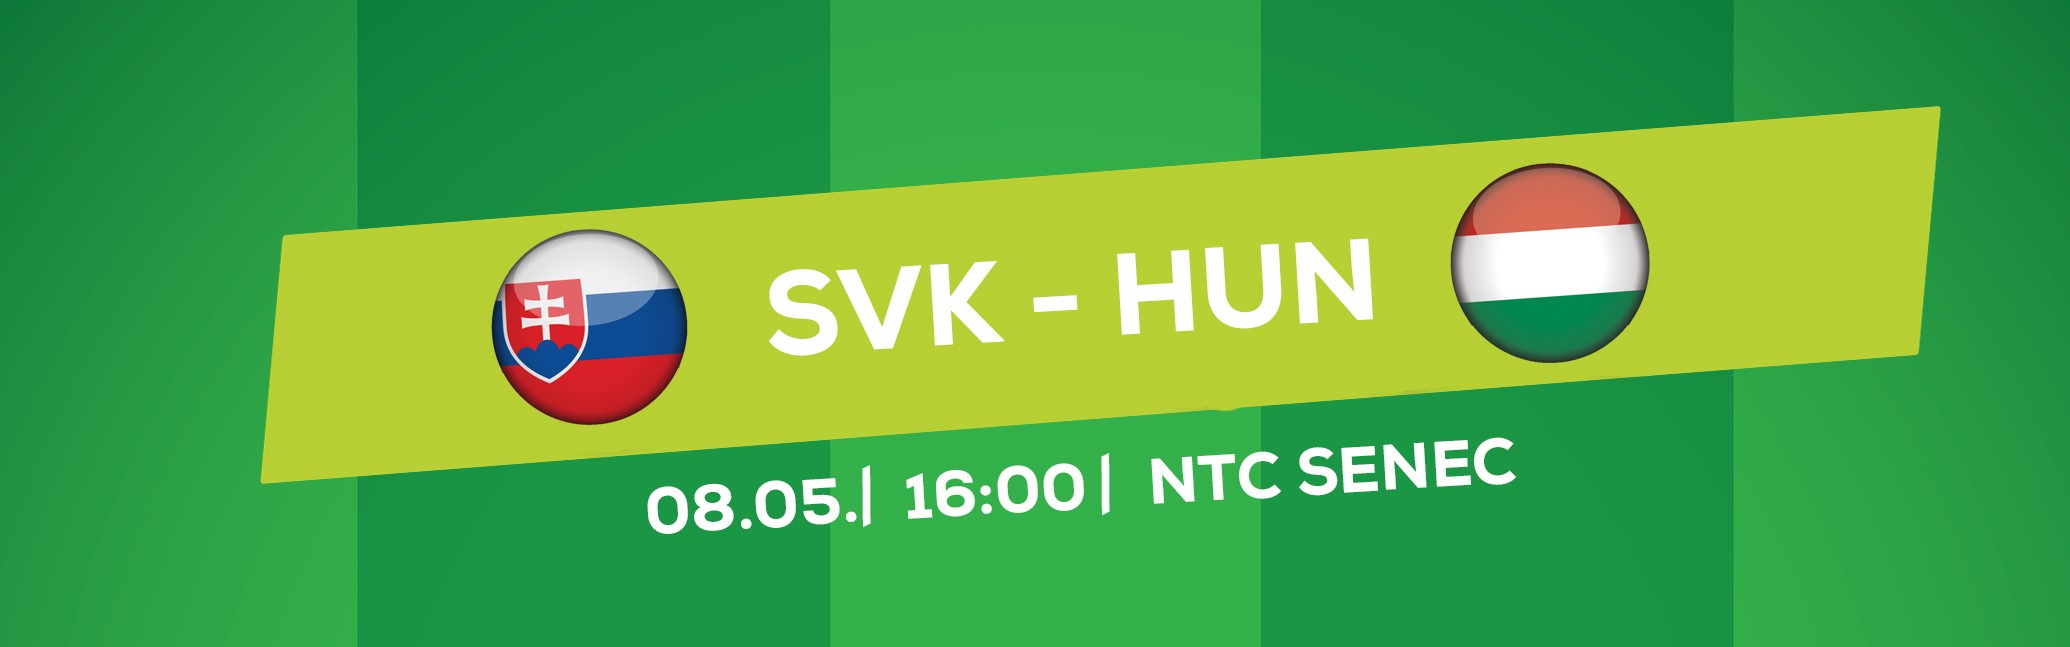 LIVE: SLOVAKIA CUP 2018: 8.5. 2018, 16:00 SLOVENSKO U18 – MAĎARSKO U18 (NTC SENEC)